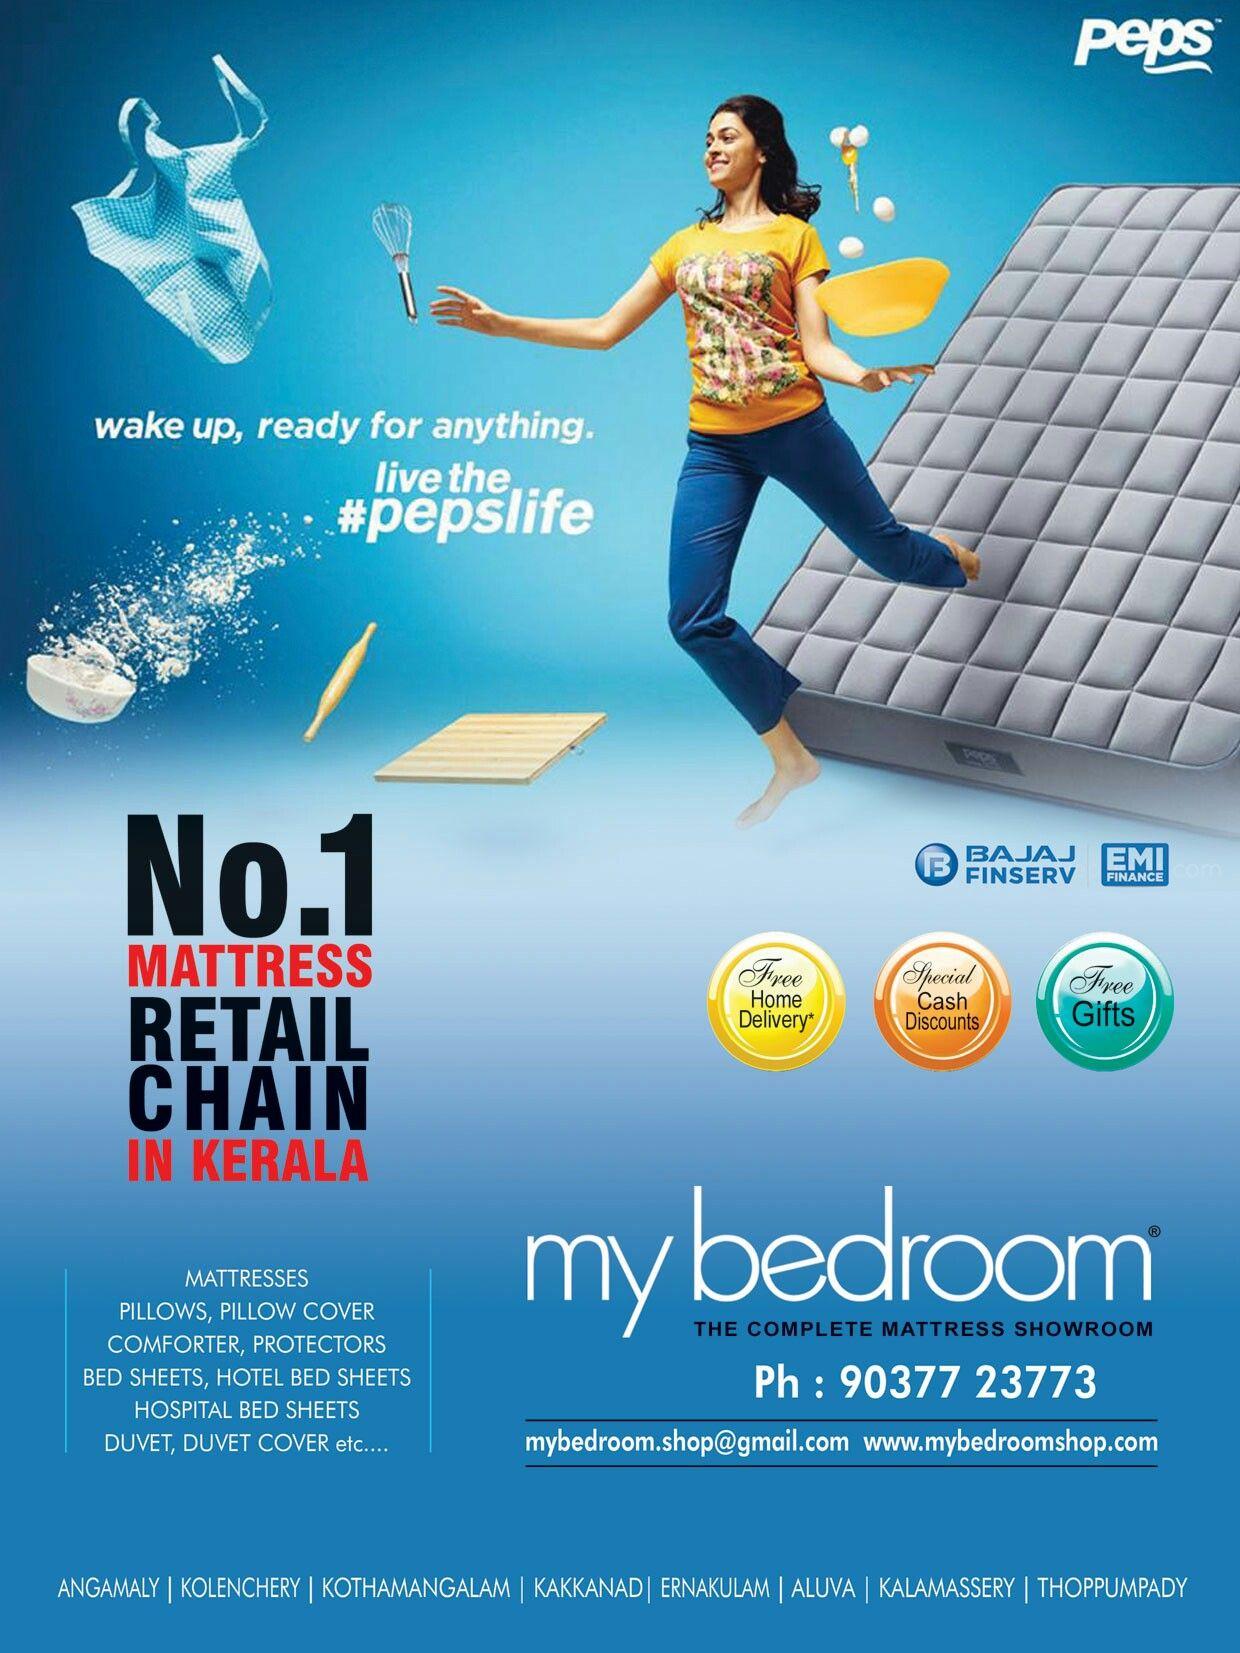 Peps Mattress Promotional Design Product Sales Design Social Media Poster